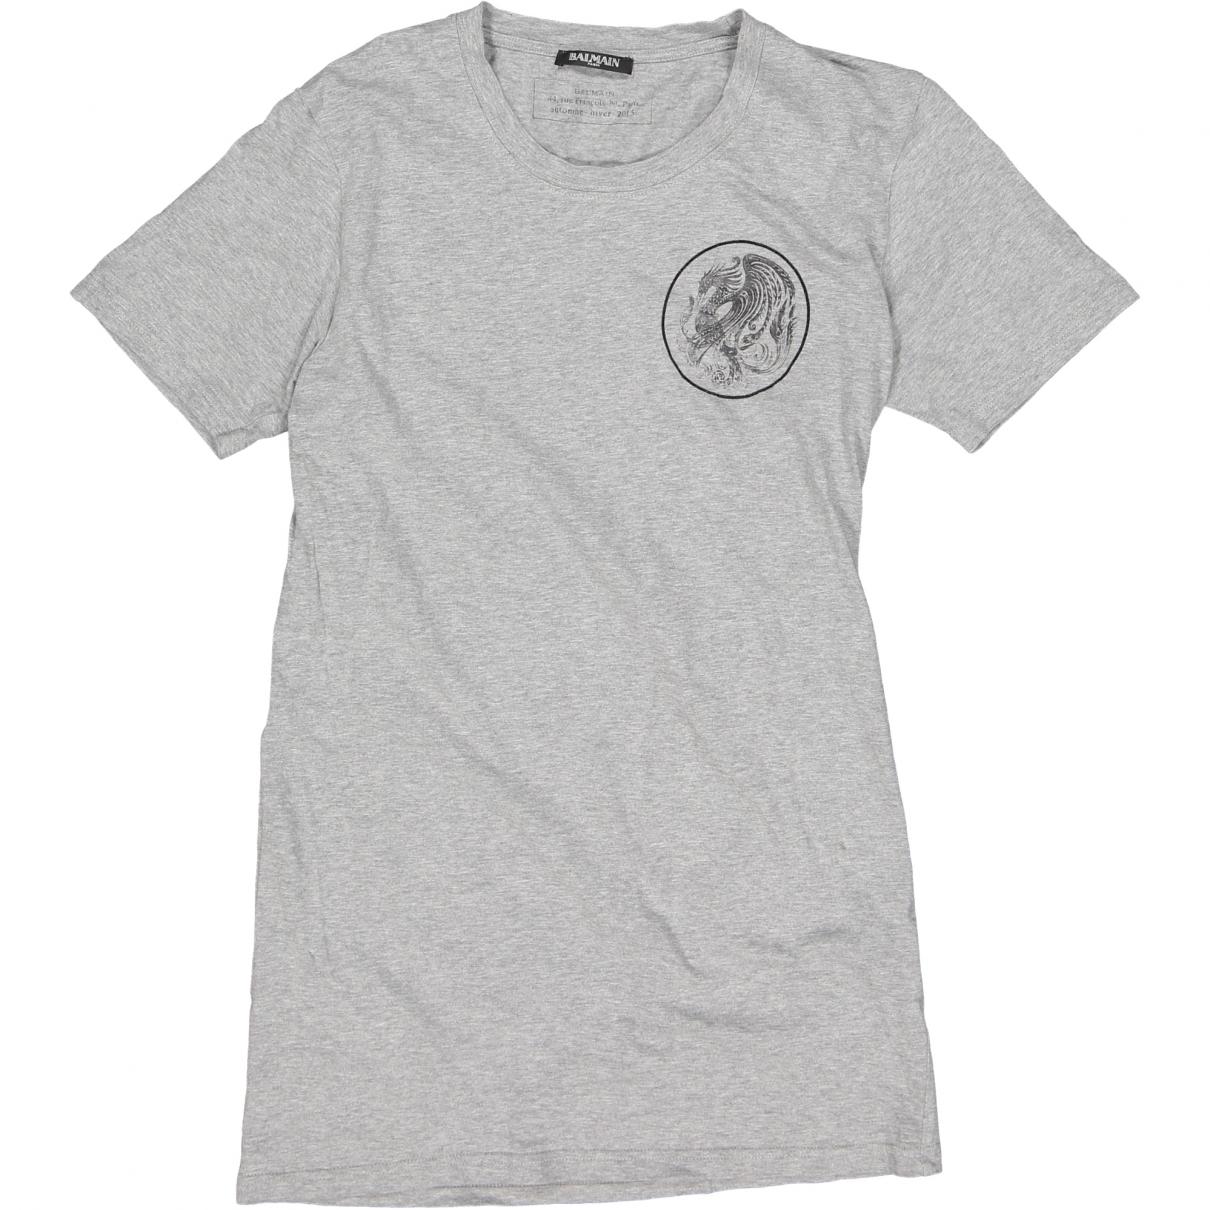 Balmain \N Grey Cotton T-shirts for Men S International